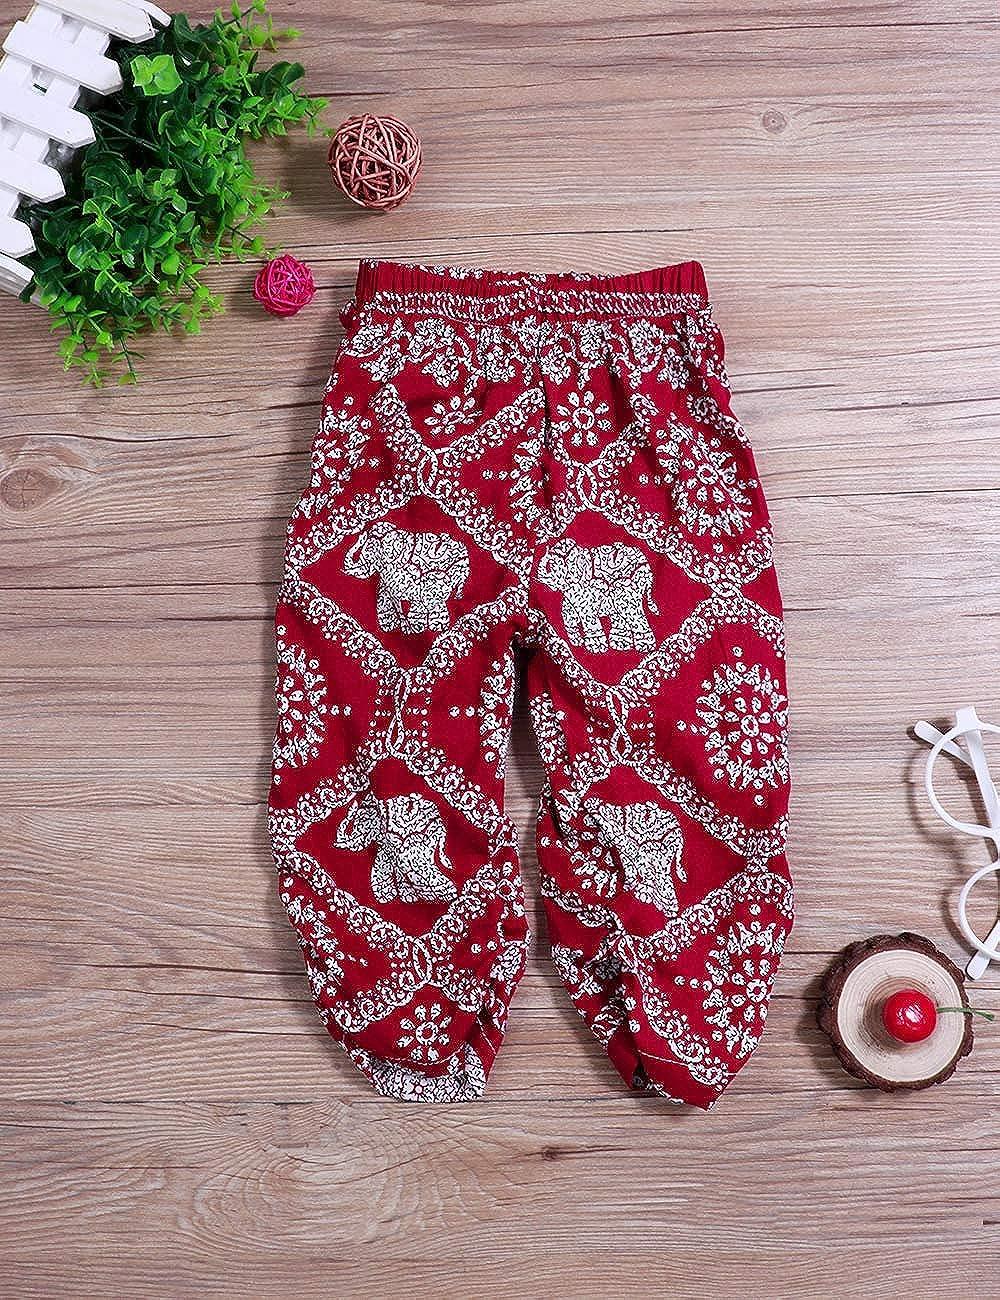 Oklady Little Girls Clothes Summer Straps Shorts Set Elephant Sleeveless Tops+Harem Pants 2Pcs Outfits for Toddler Girls